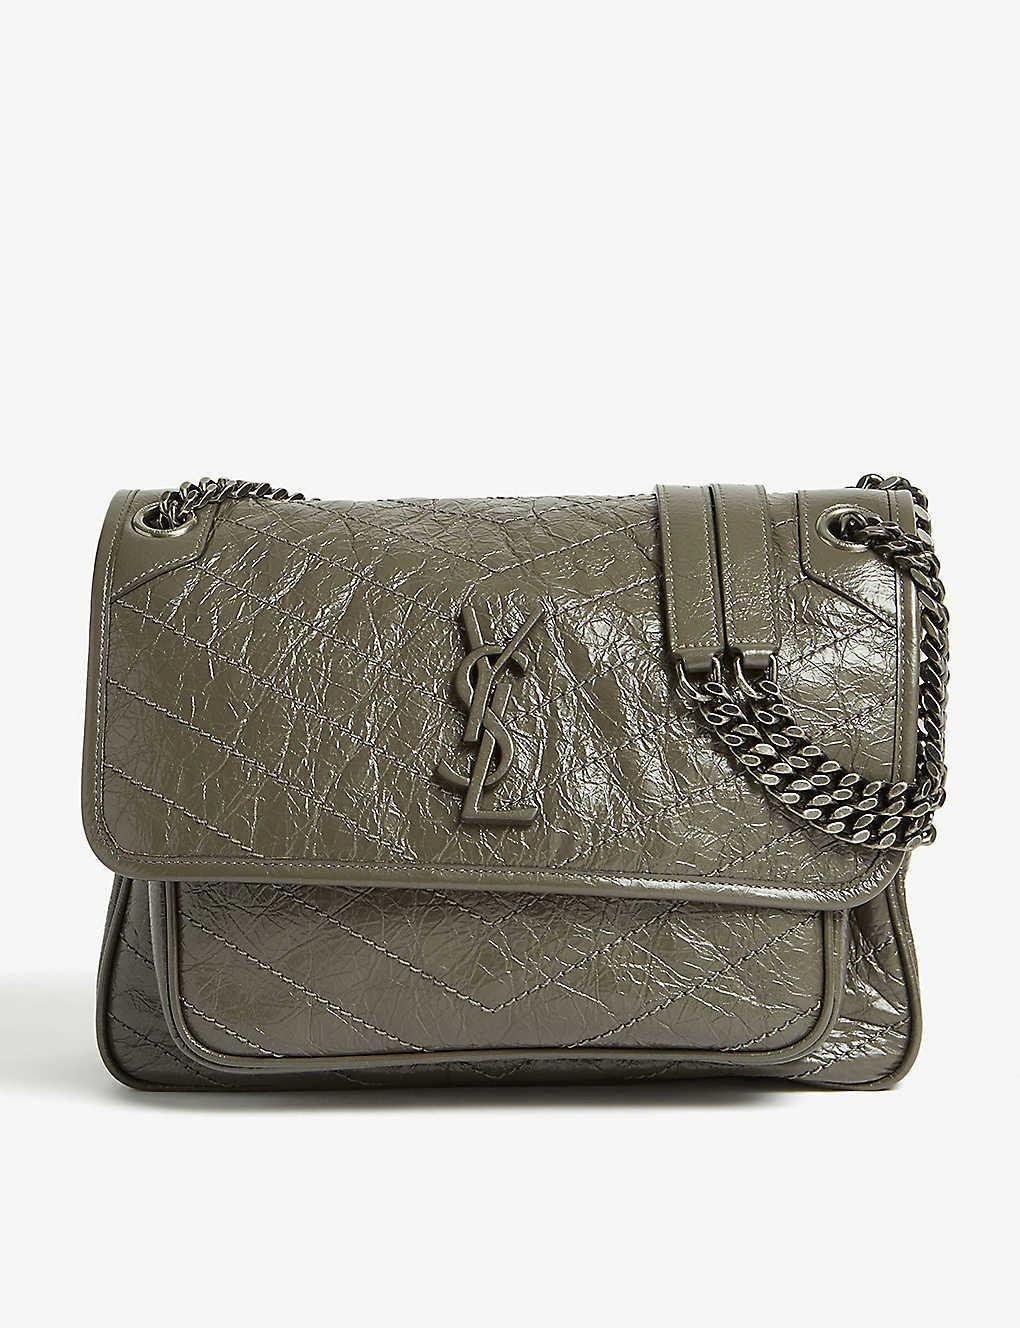 0479c37a4d Medium Monogram Niki leather cross-body bag - Beton grey khaki ...